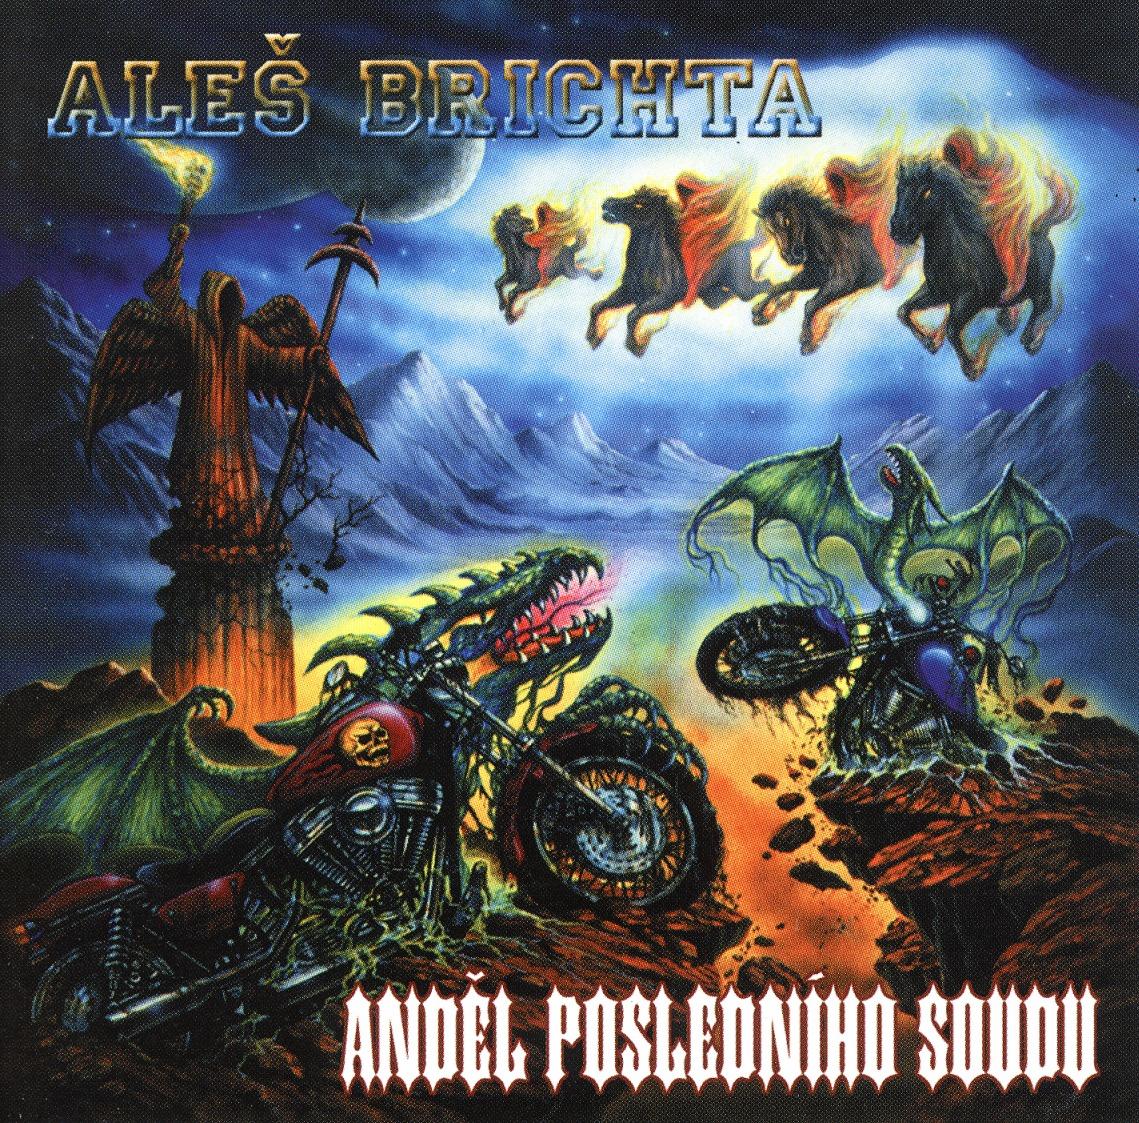 ALES BRICHTA (Czech Republic) / Andel Posledniho Soudu